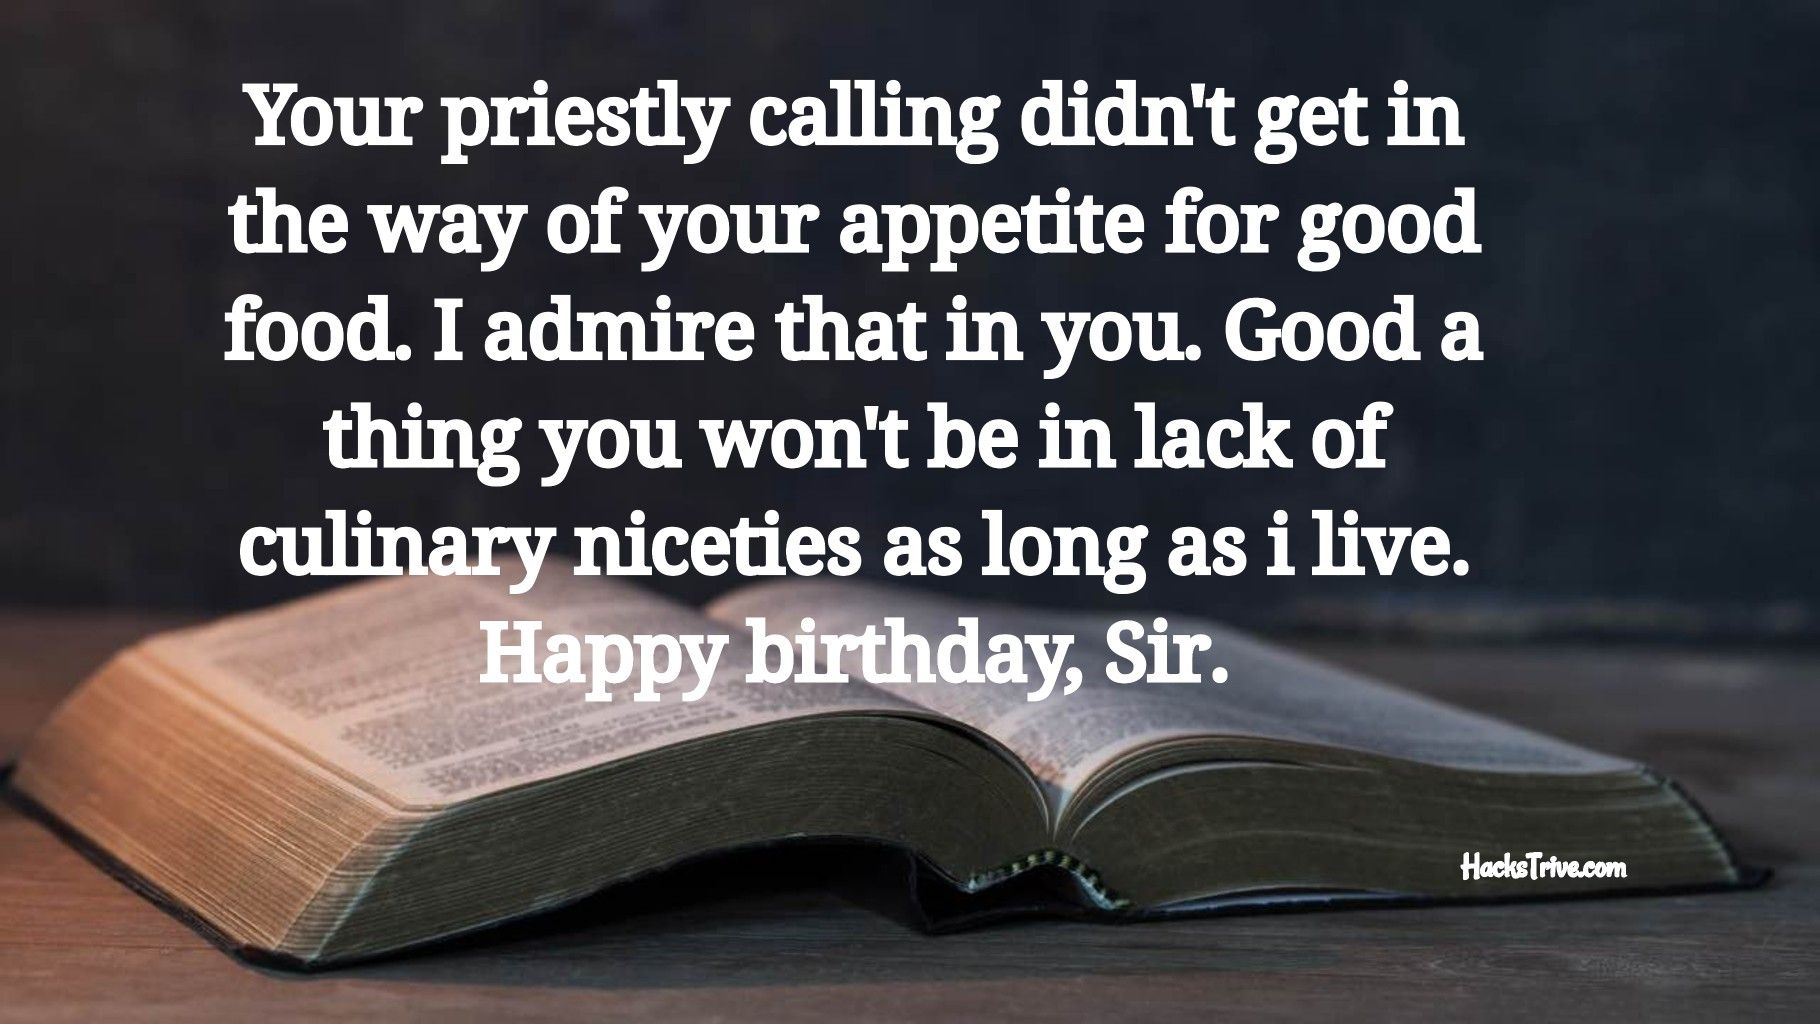 Funny Birthday Wishes For Pastor Birthday Wishes Funny Inspirational Birthday Wishes Birthday Wishes